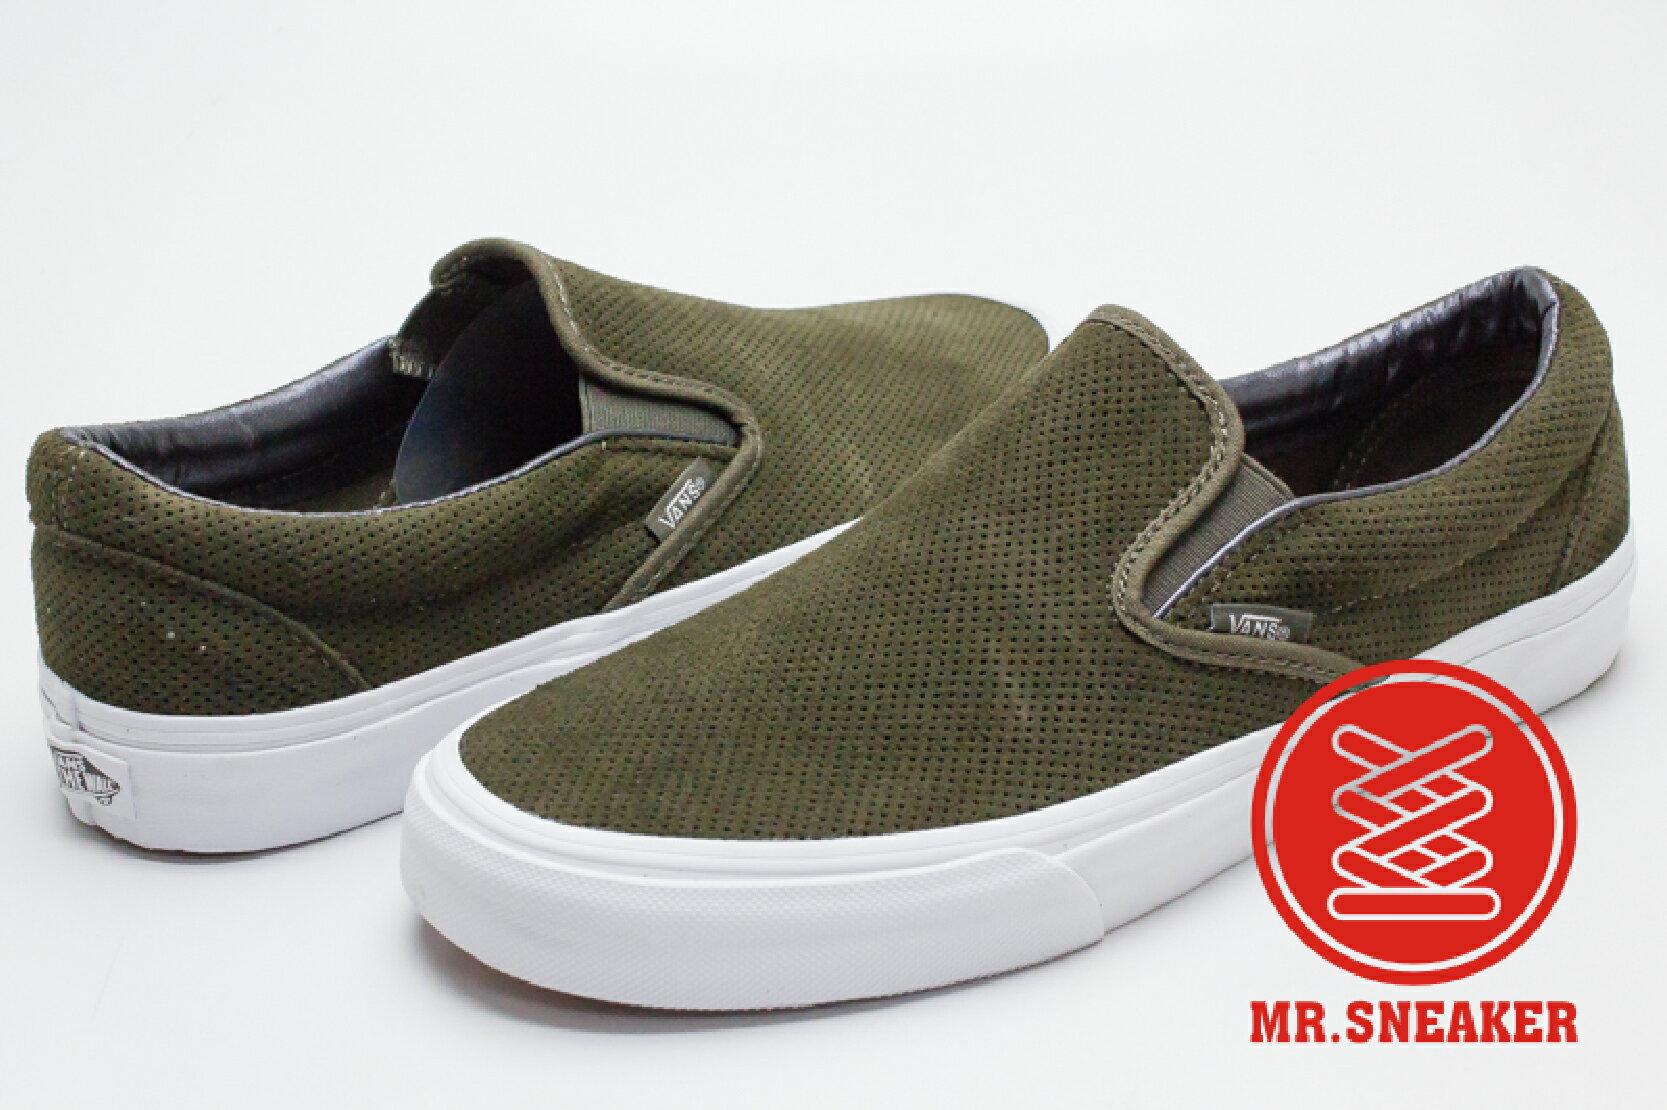 ☆Mr.Sneaker☆ VANS Slip-On 2016 秋冬/AW 休閒/懶人鞋 麂皮 網眼/洞洞 軍綠色 男女款